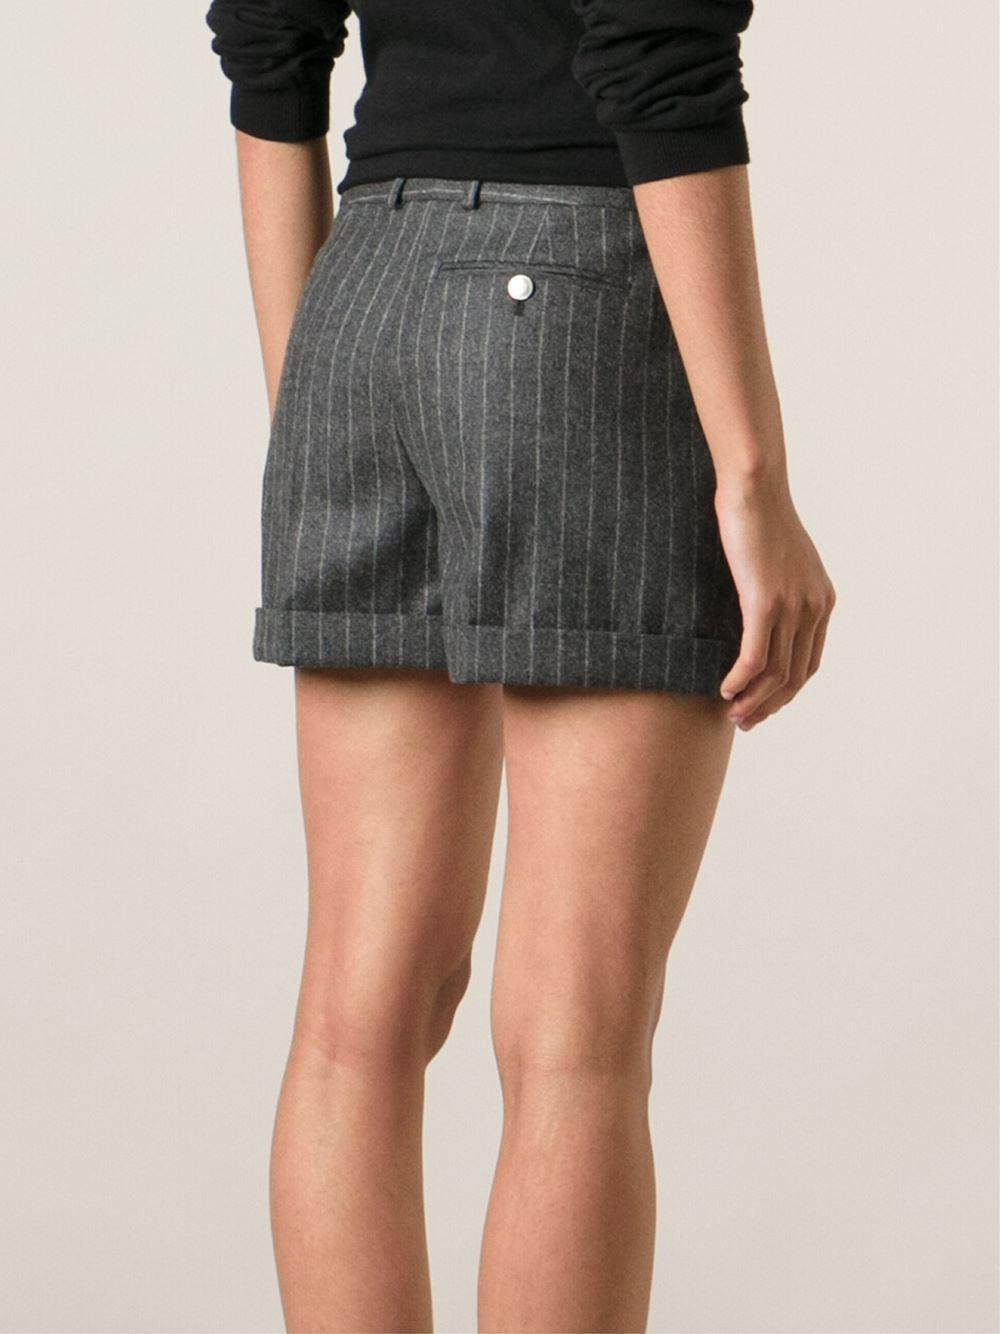 Alexander Mcqueen Pinstripe Shorts In Gray  Lyst-2940